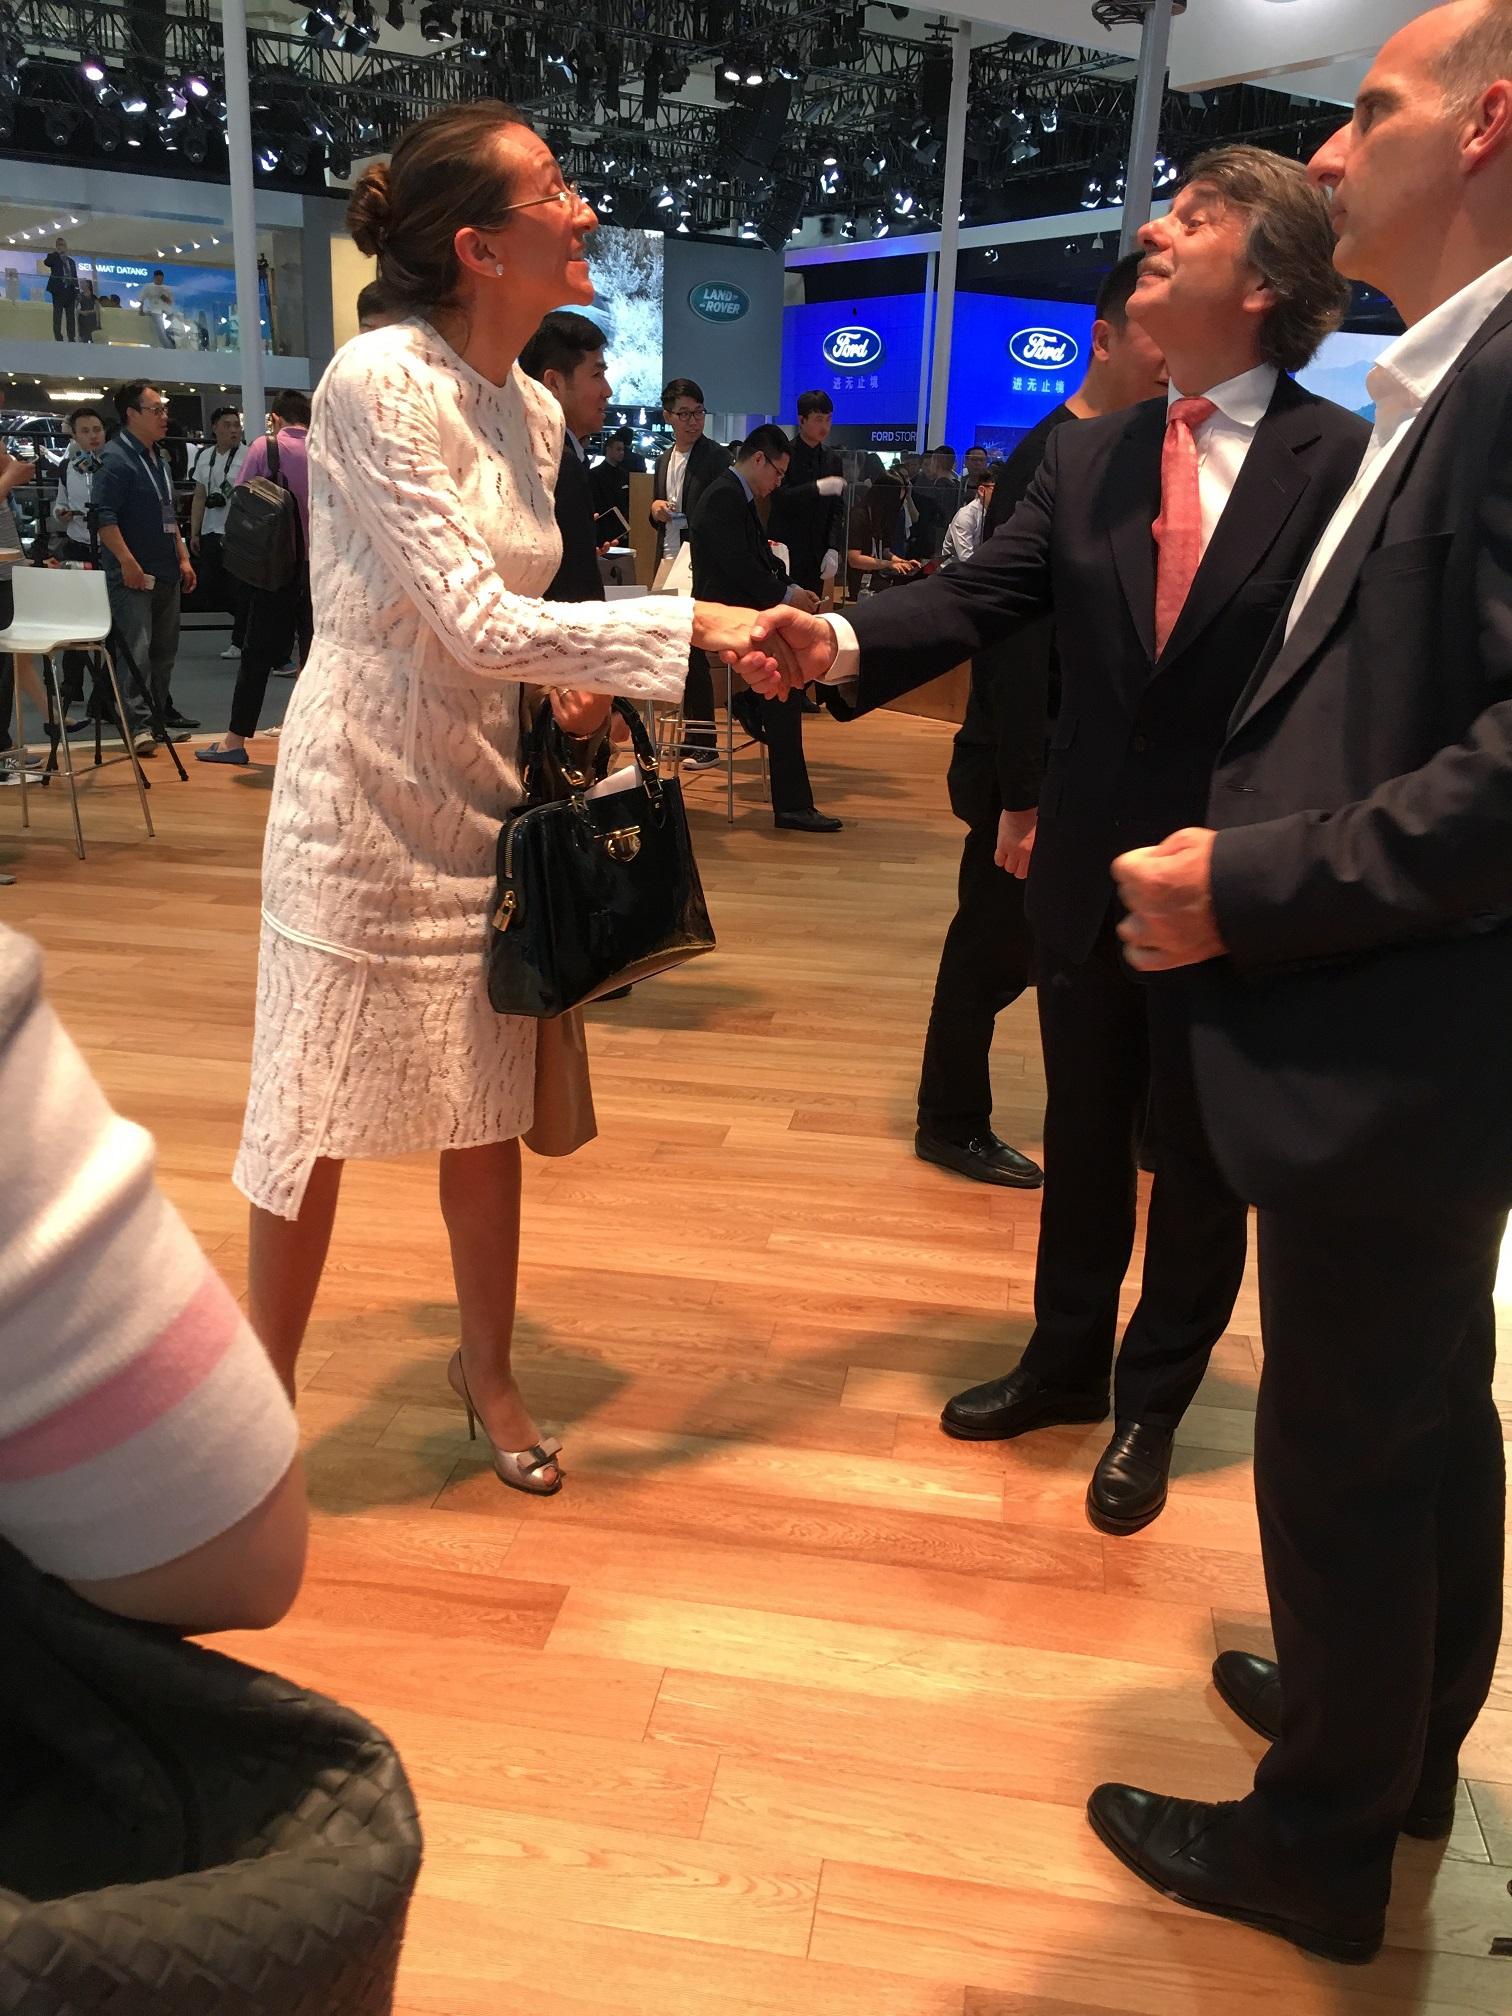 Vanessa Moriel greets Ralf Speth, Global CEO of Jaguar Land Rover.